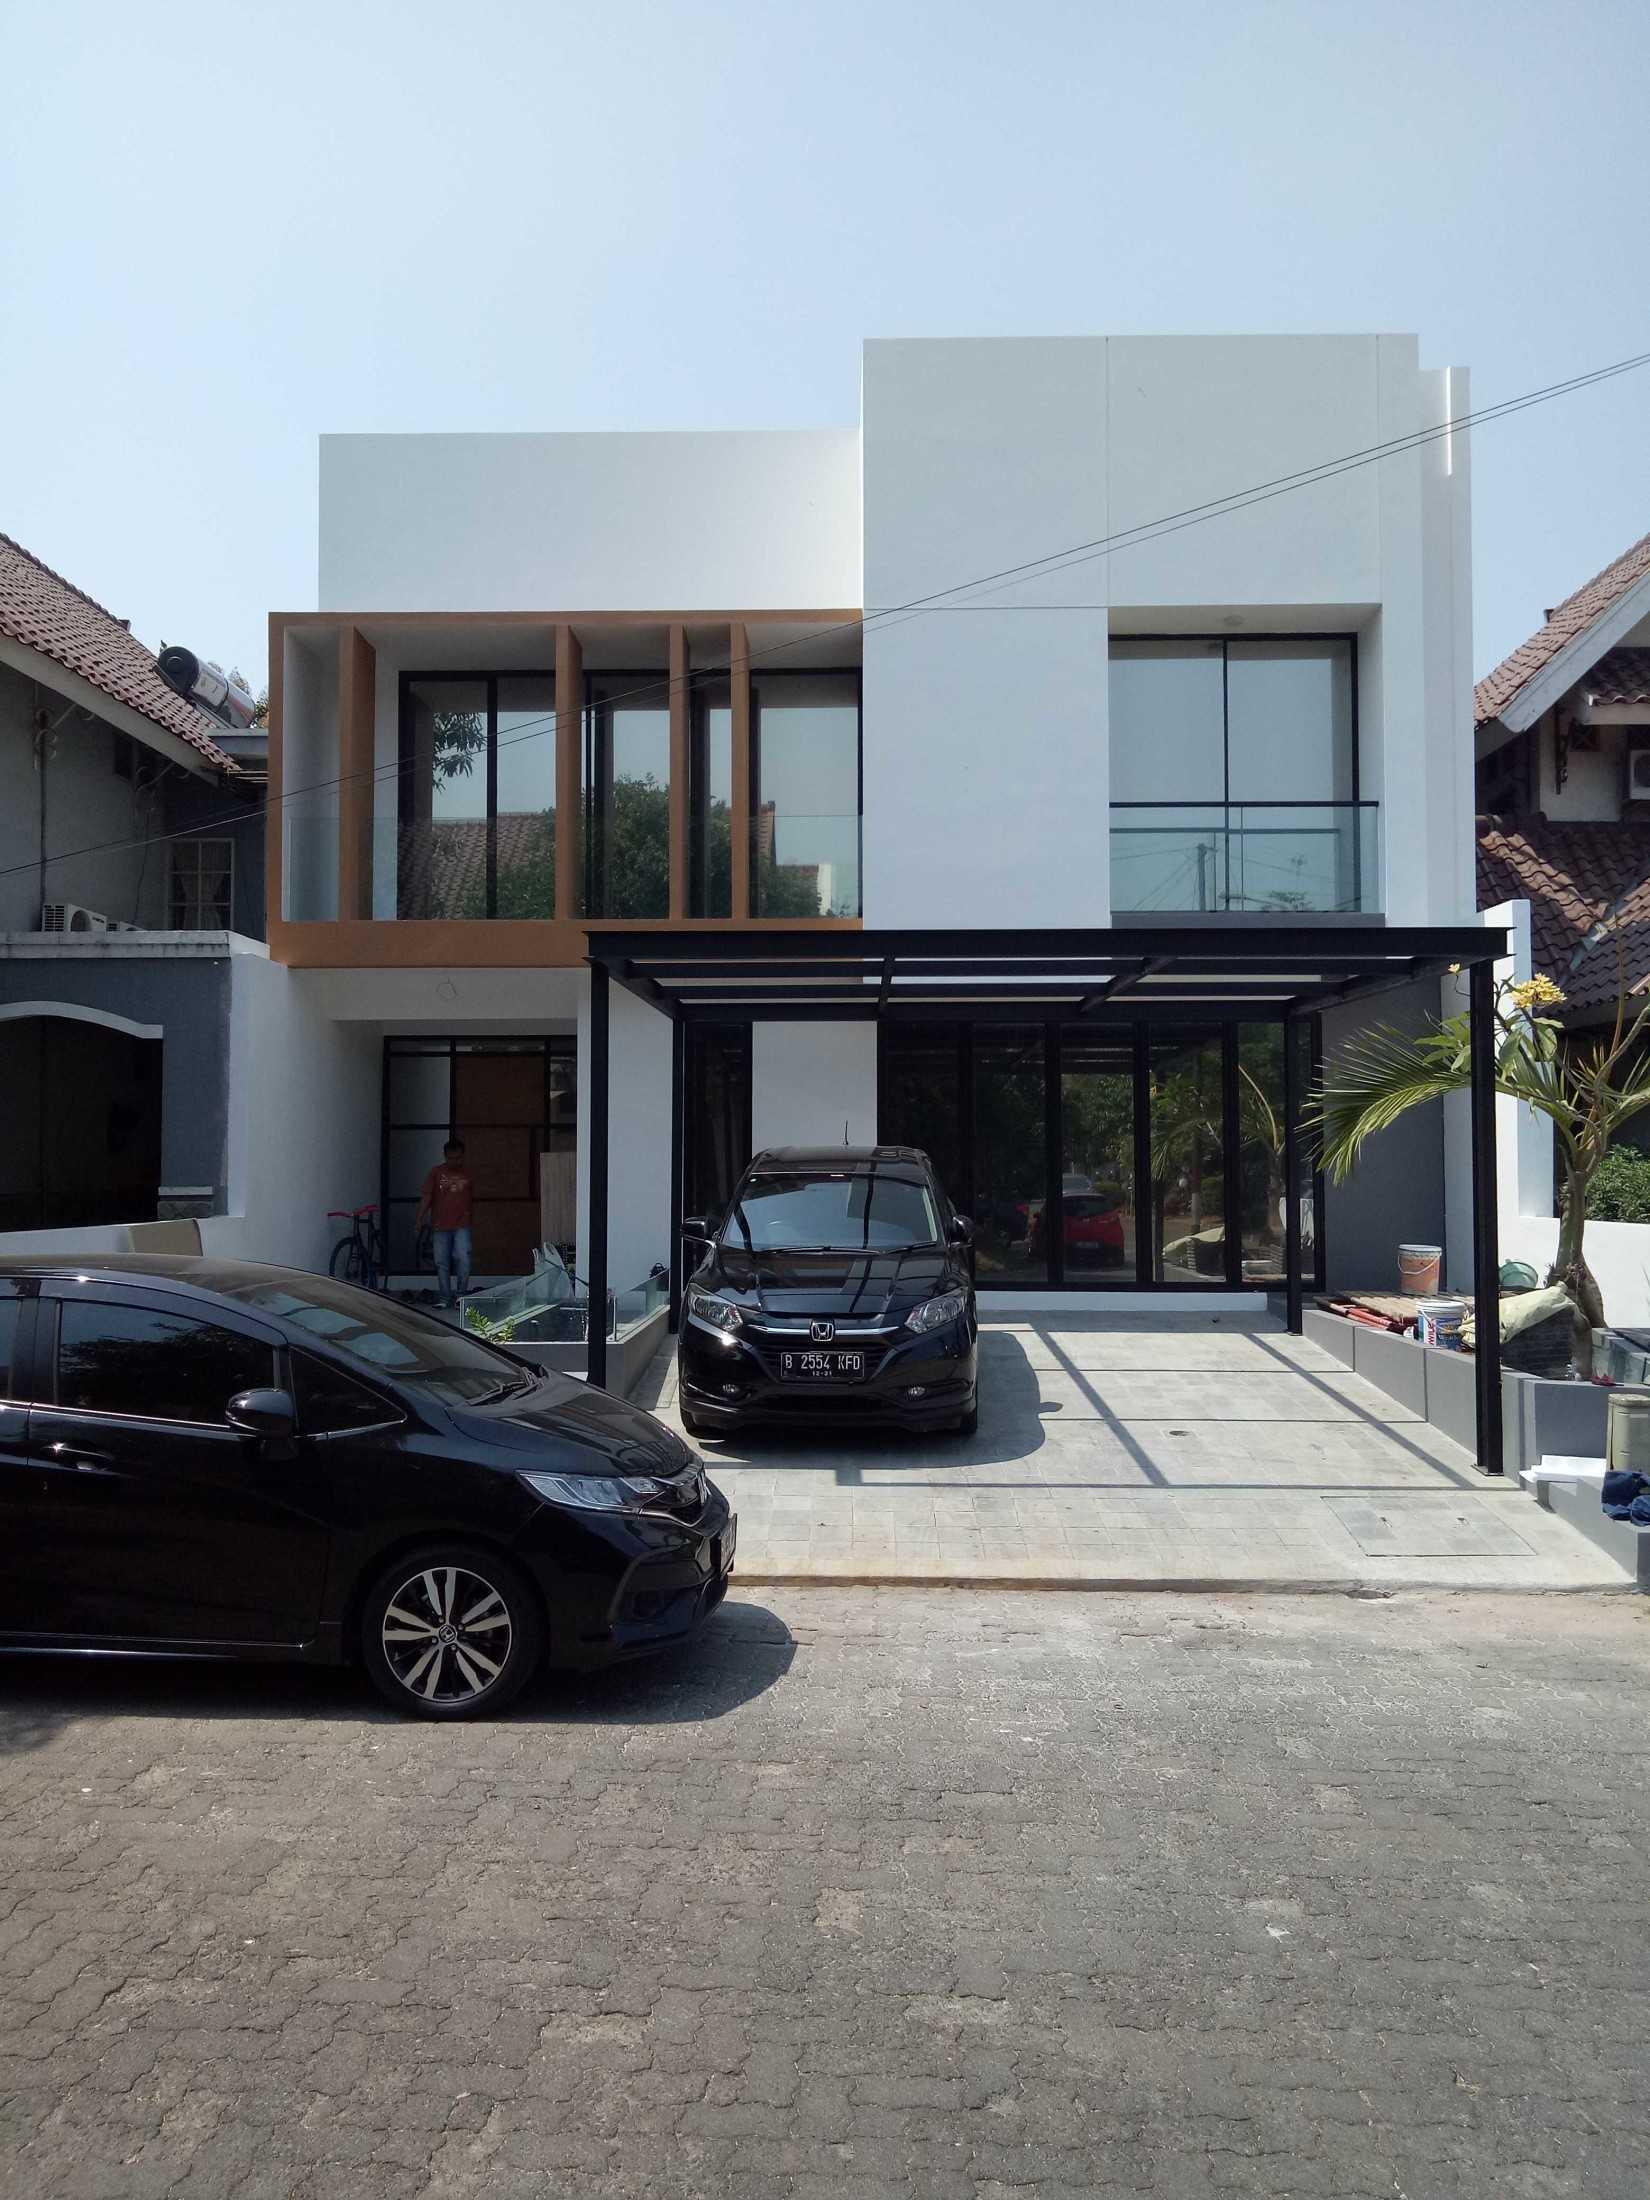 Aksa  D House Jatibening, Kec. Pondokgede, Kota Bks, Jawa Barat, Indonesia Jatibening, Kec. Pondokgede, Kota Bks, Jawa Barat, Indonesia Aksa-D-House  82773